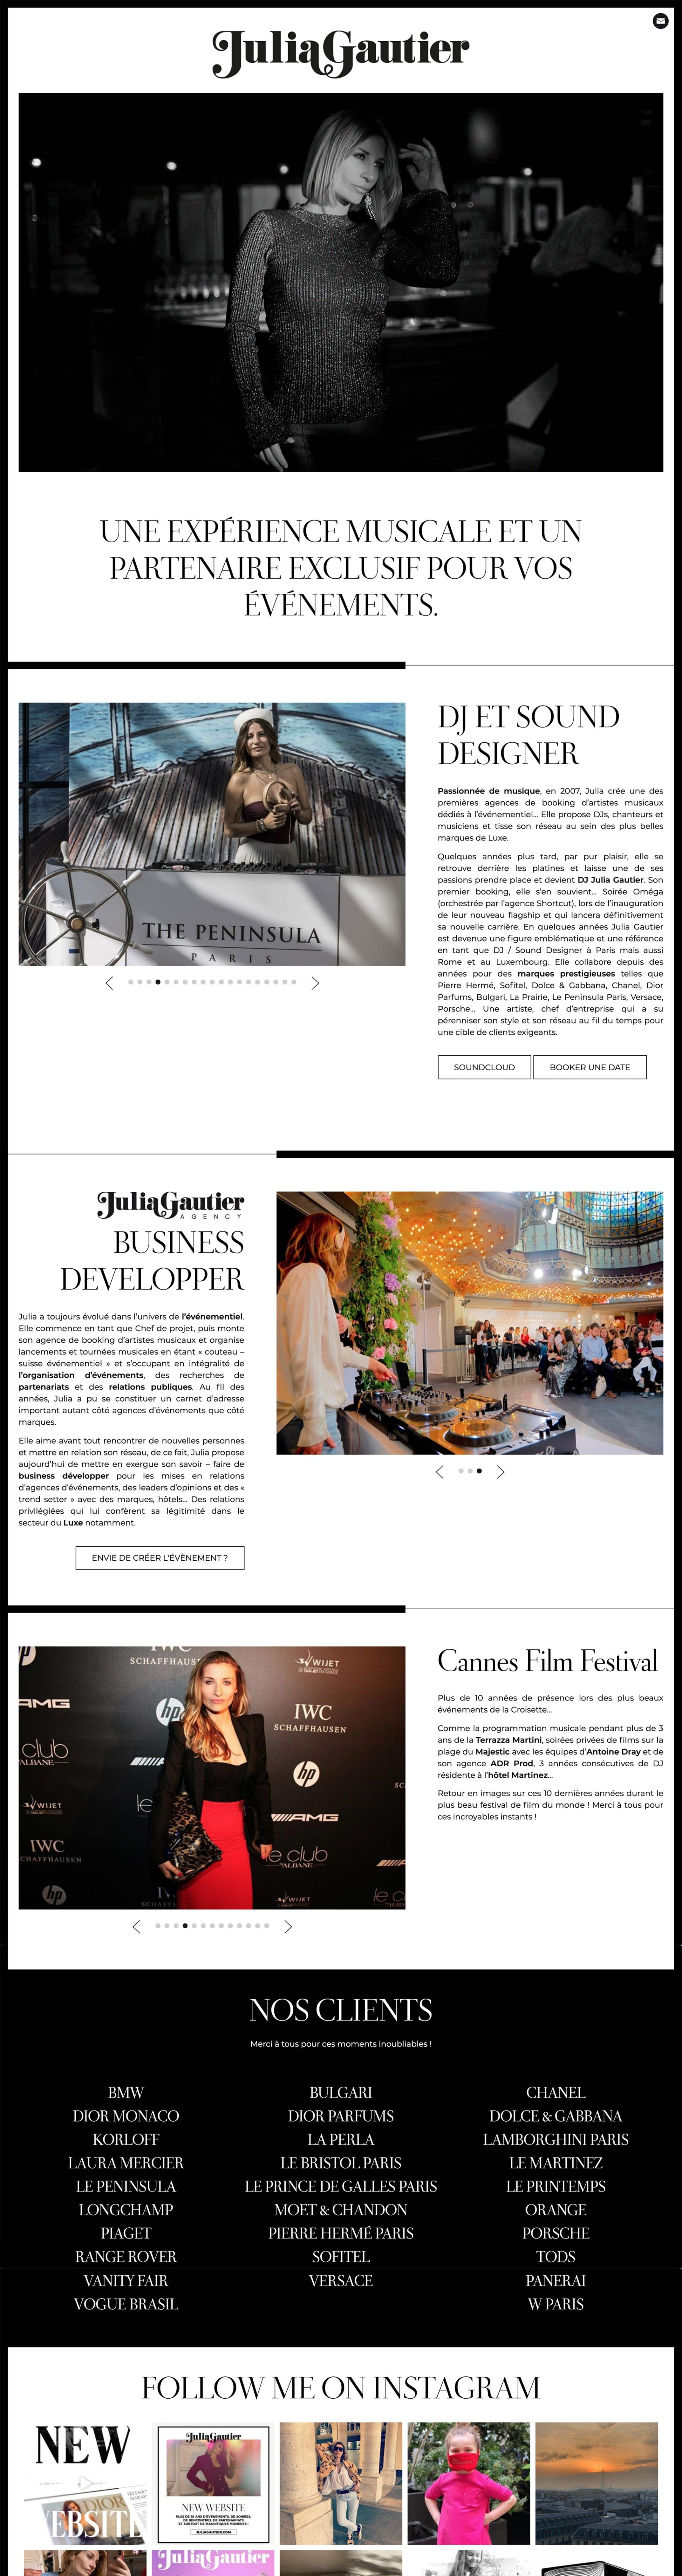 Ecran 1 du site Julia Gautier